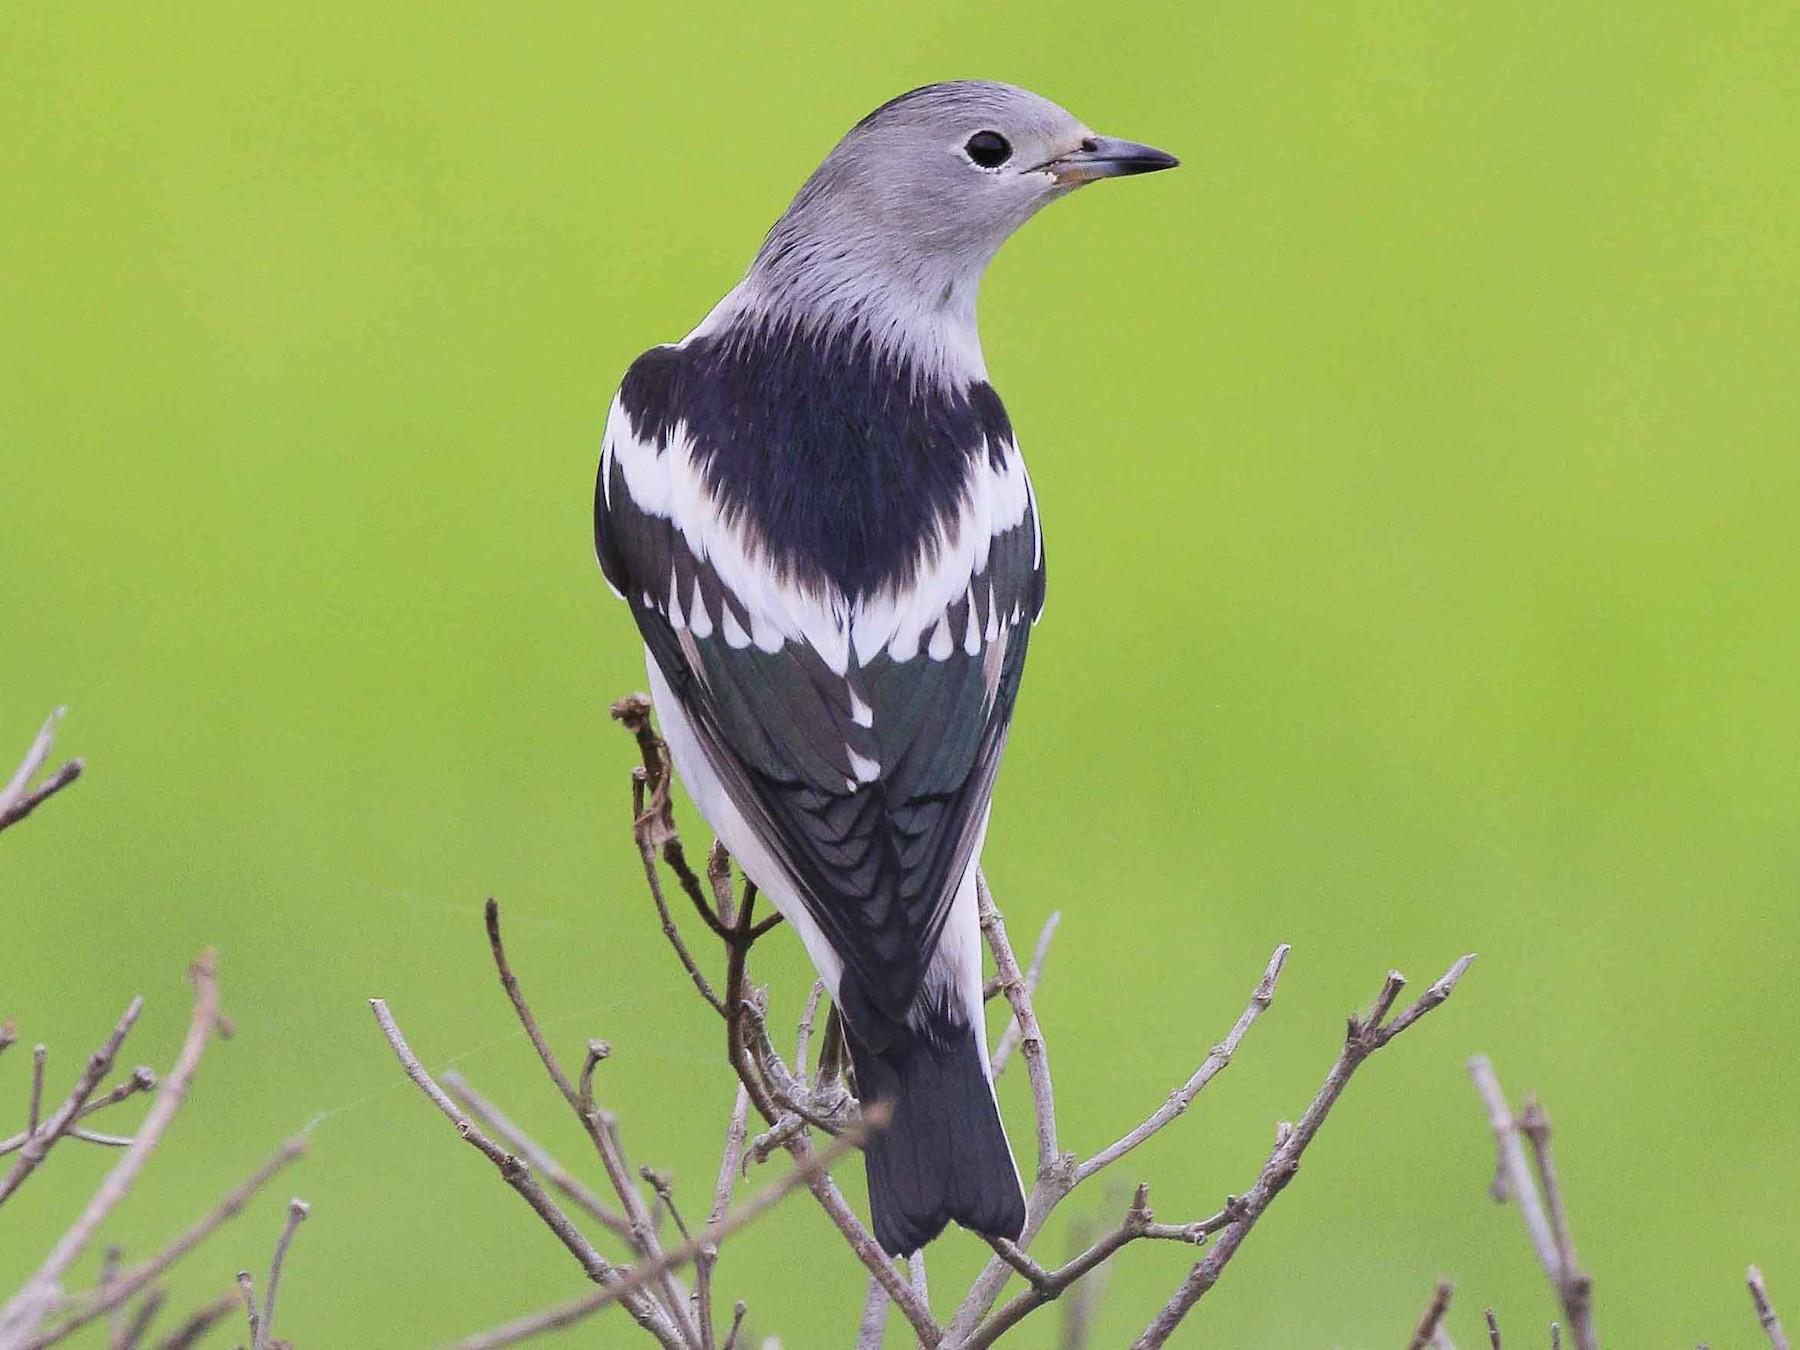 Daurian Starling - Neoh Hor Kee